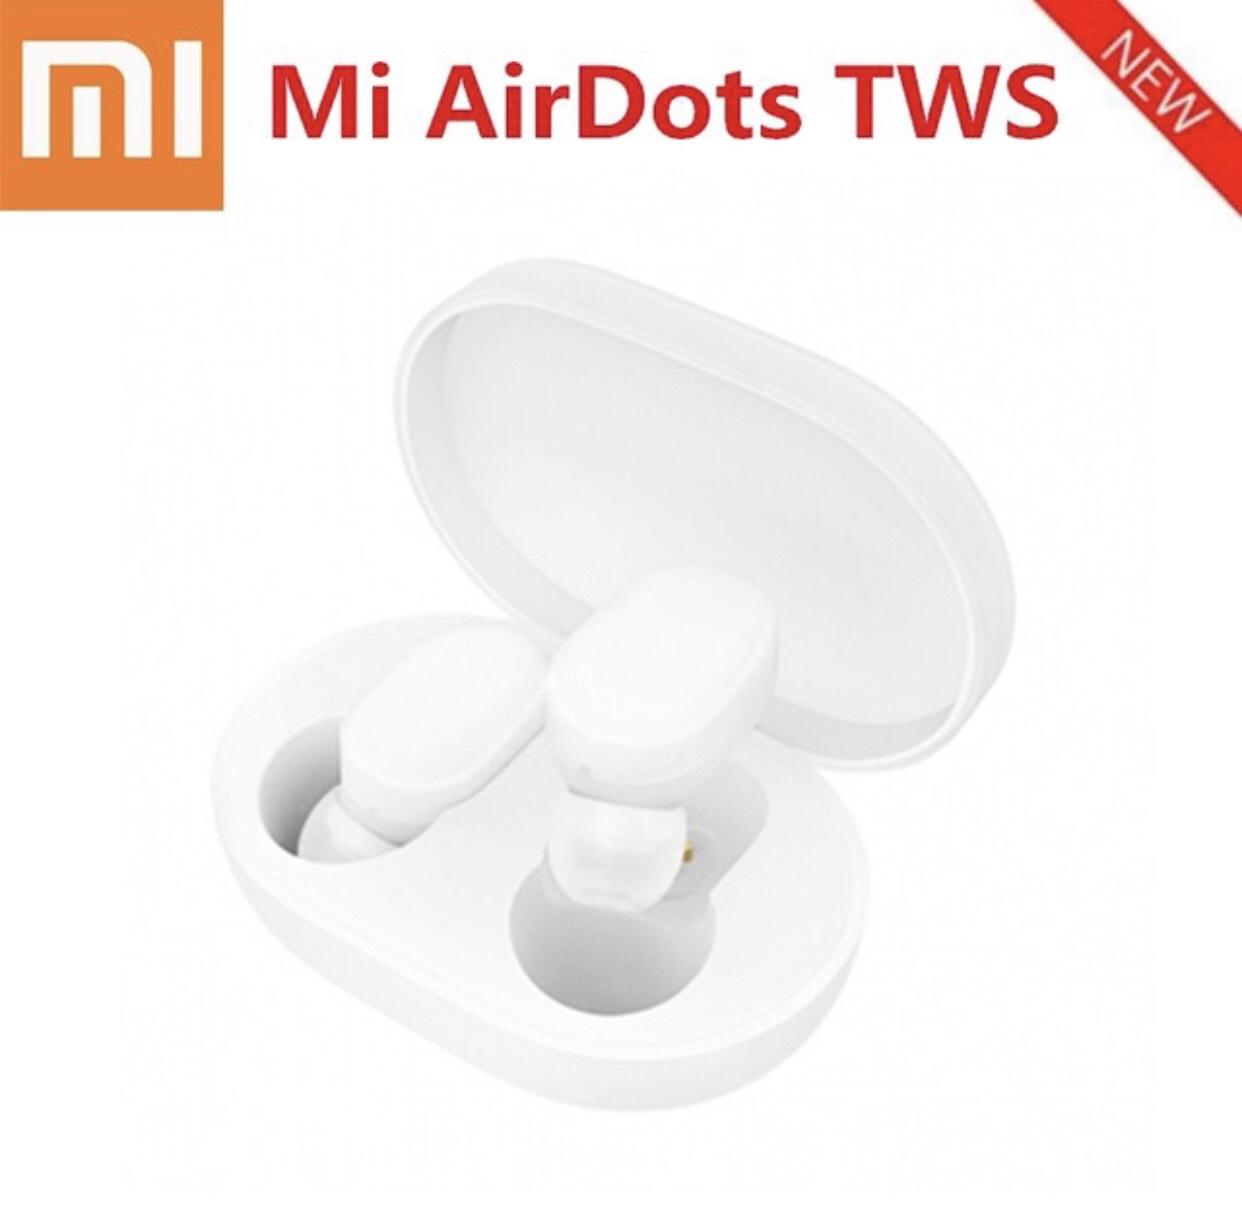 Écouteurs sans-fil Xiaomi AirDots TWS Youth Edition - Bluetooth 5.0, Blanc